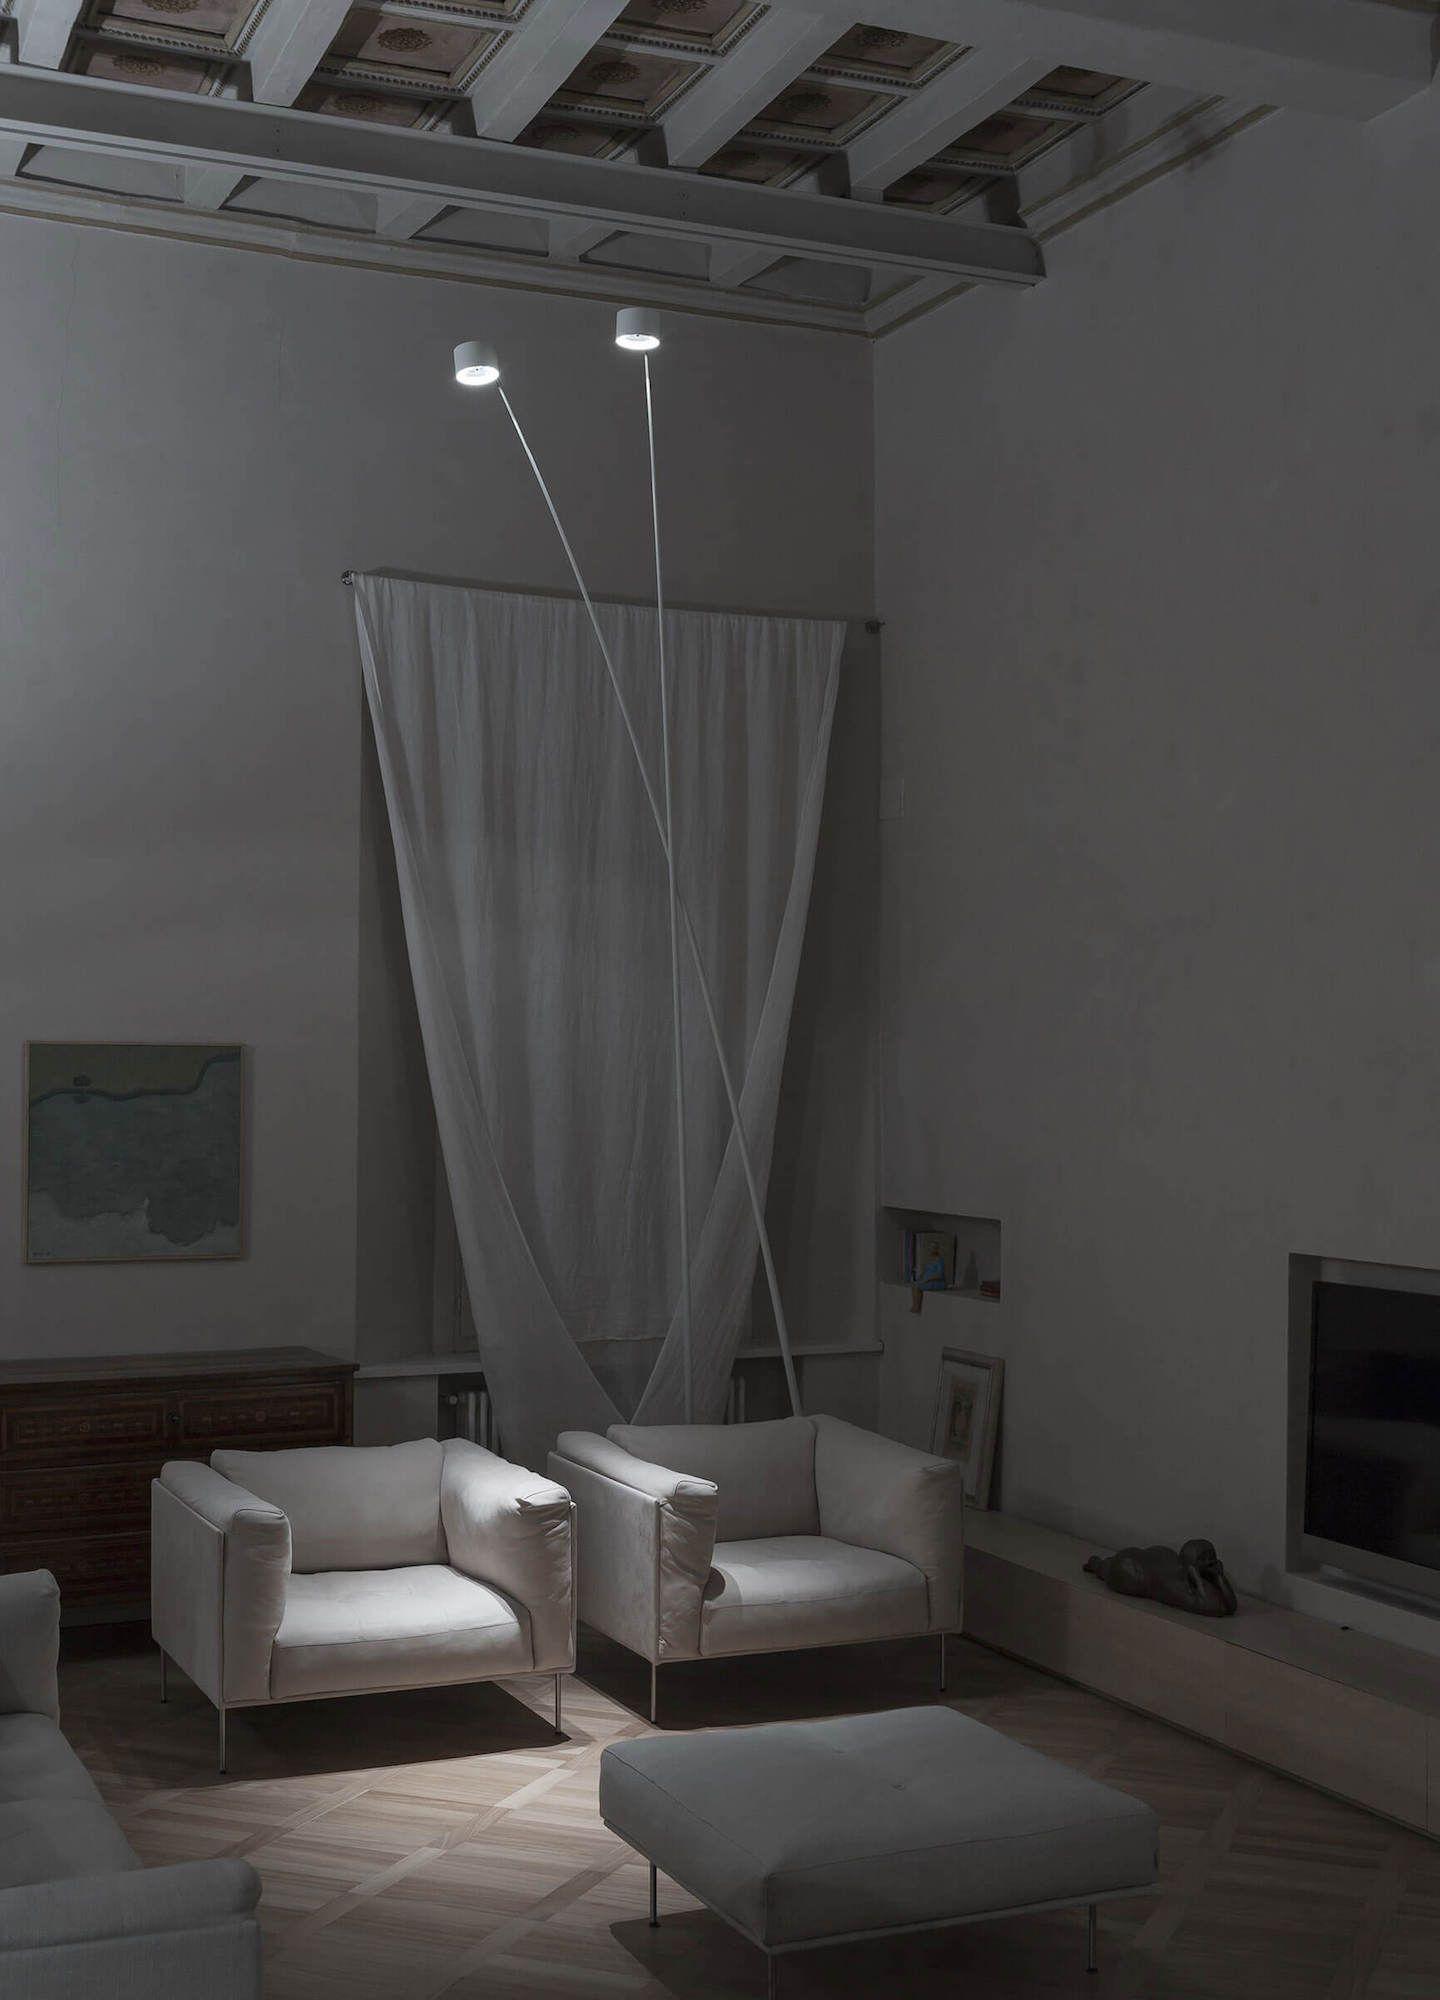 apartment-piacenza-studio-blesi-subitoni-14